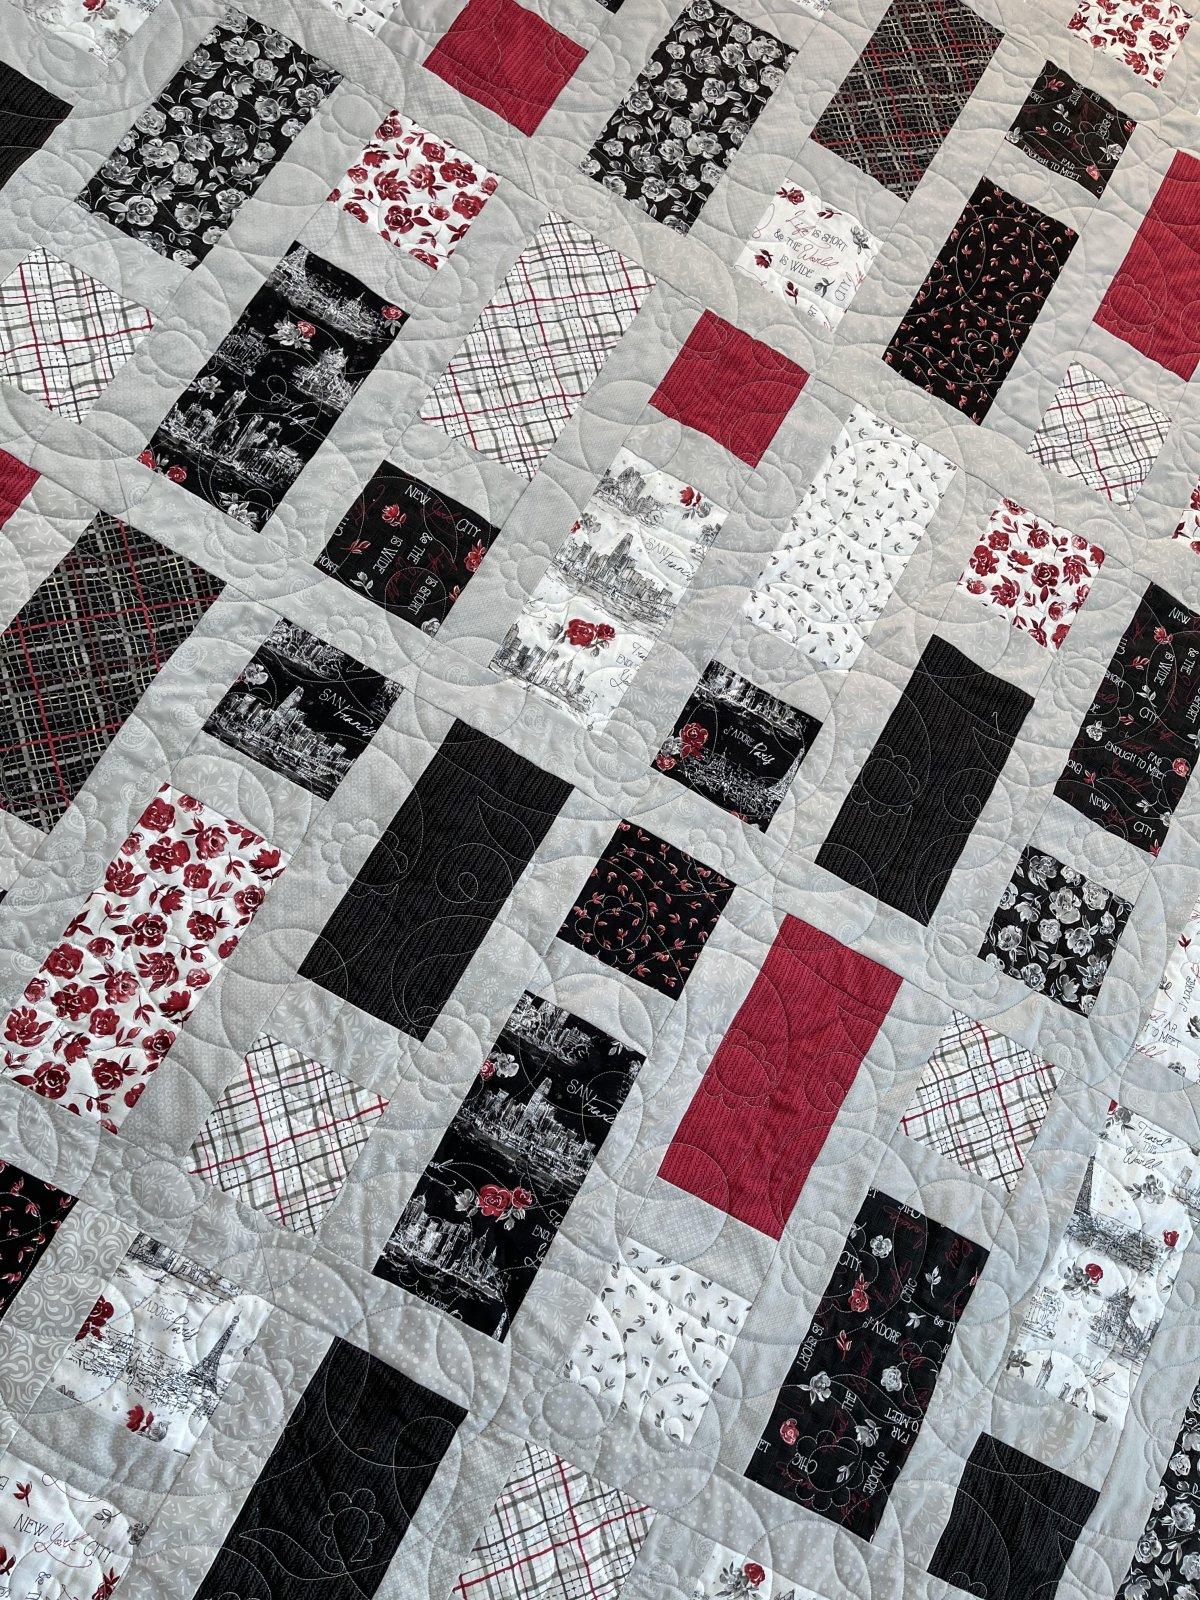 Travel the World Quilt Kit - 82 x 88 Quilt Kit - Wilmington Fabrics